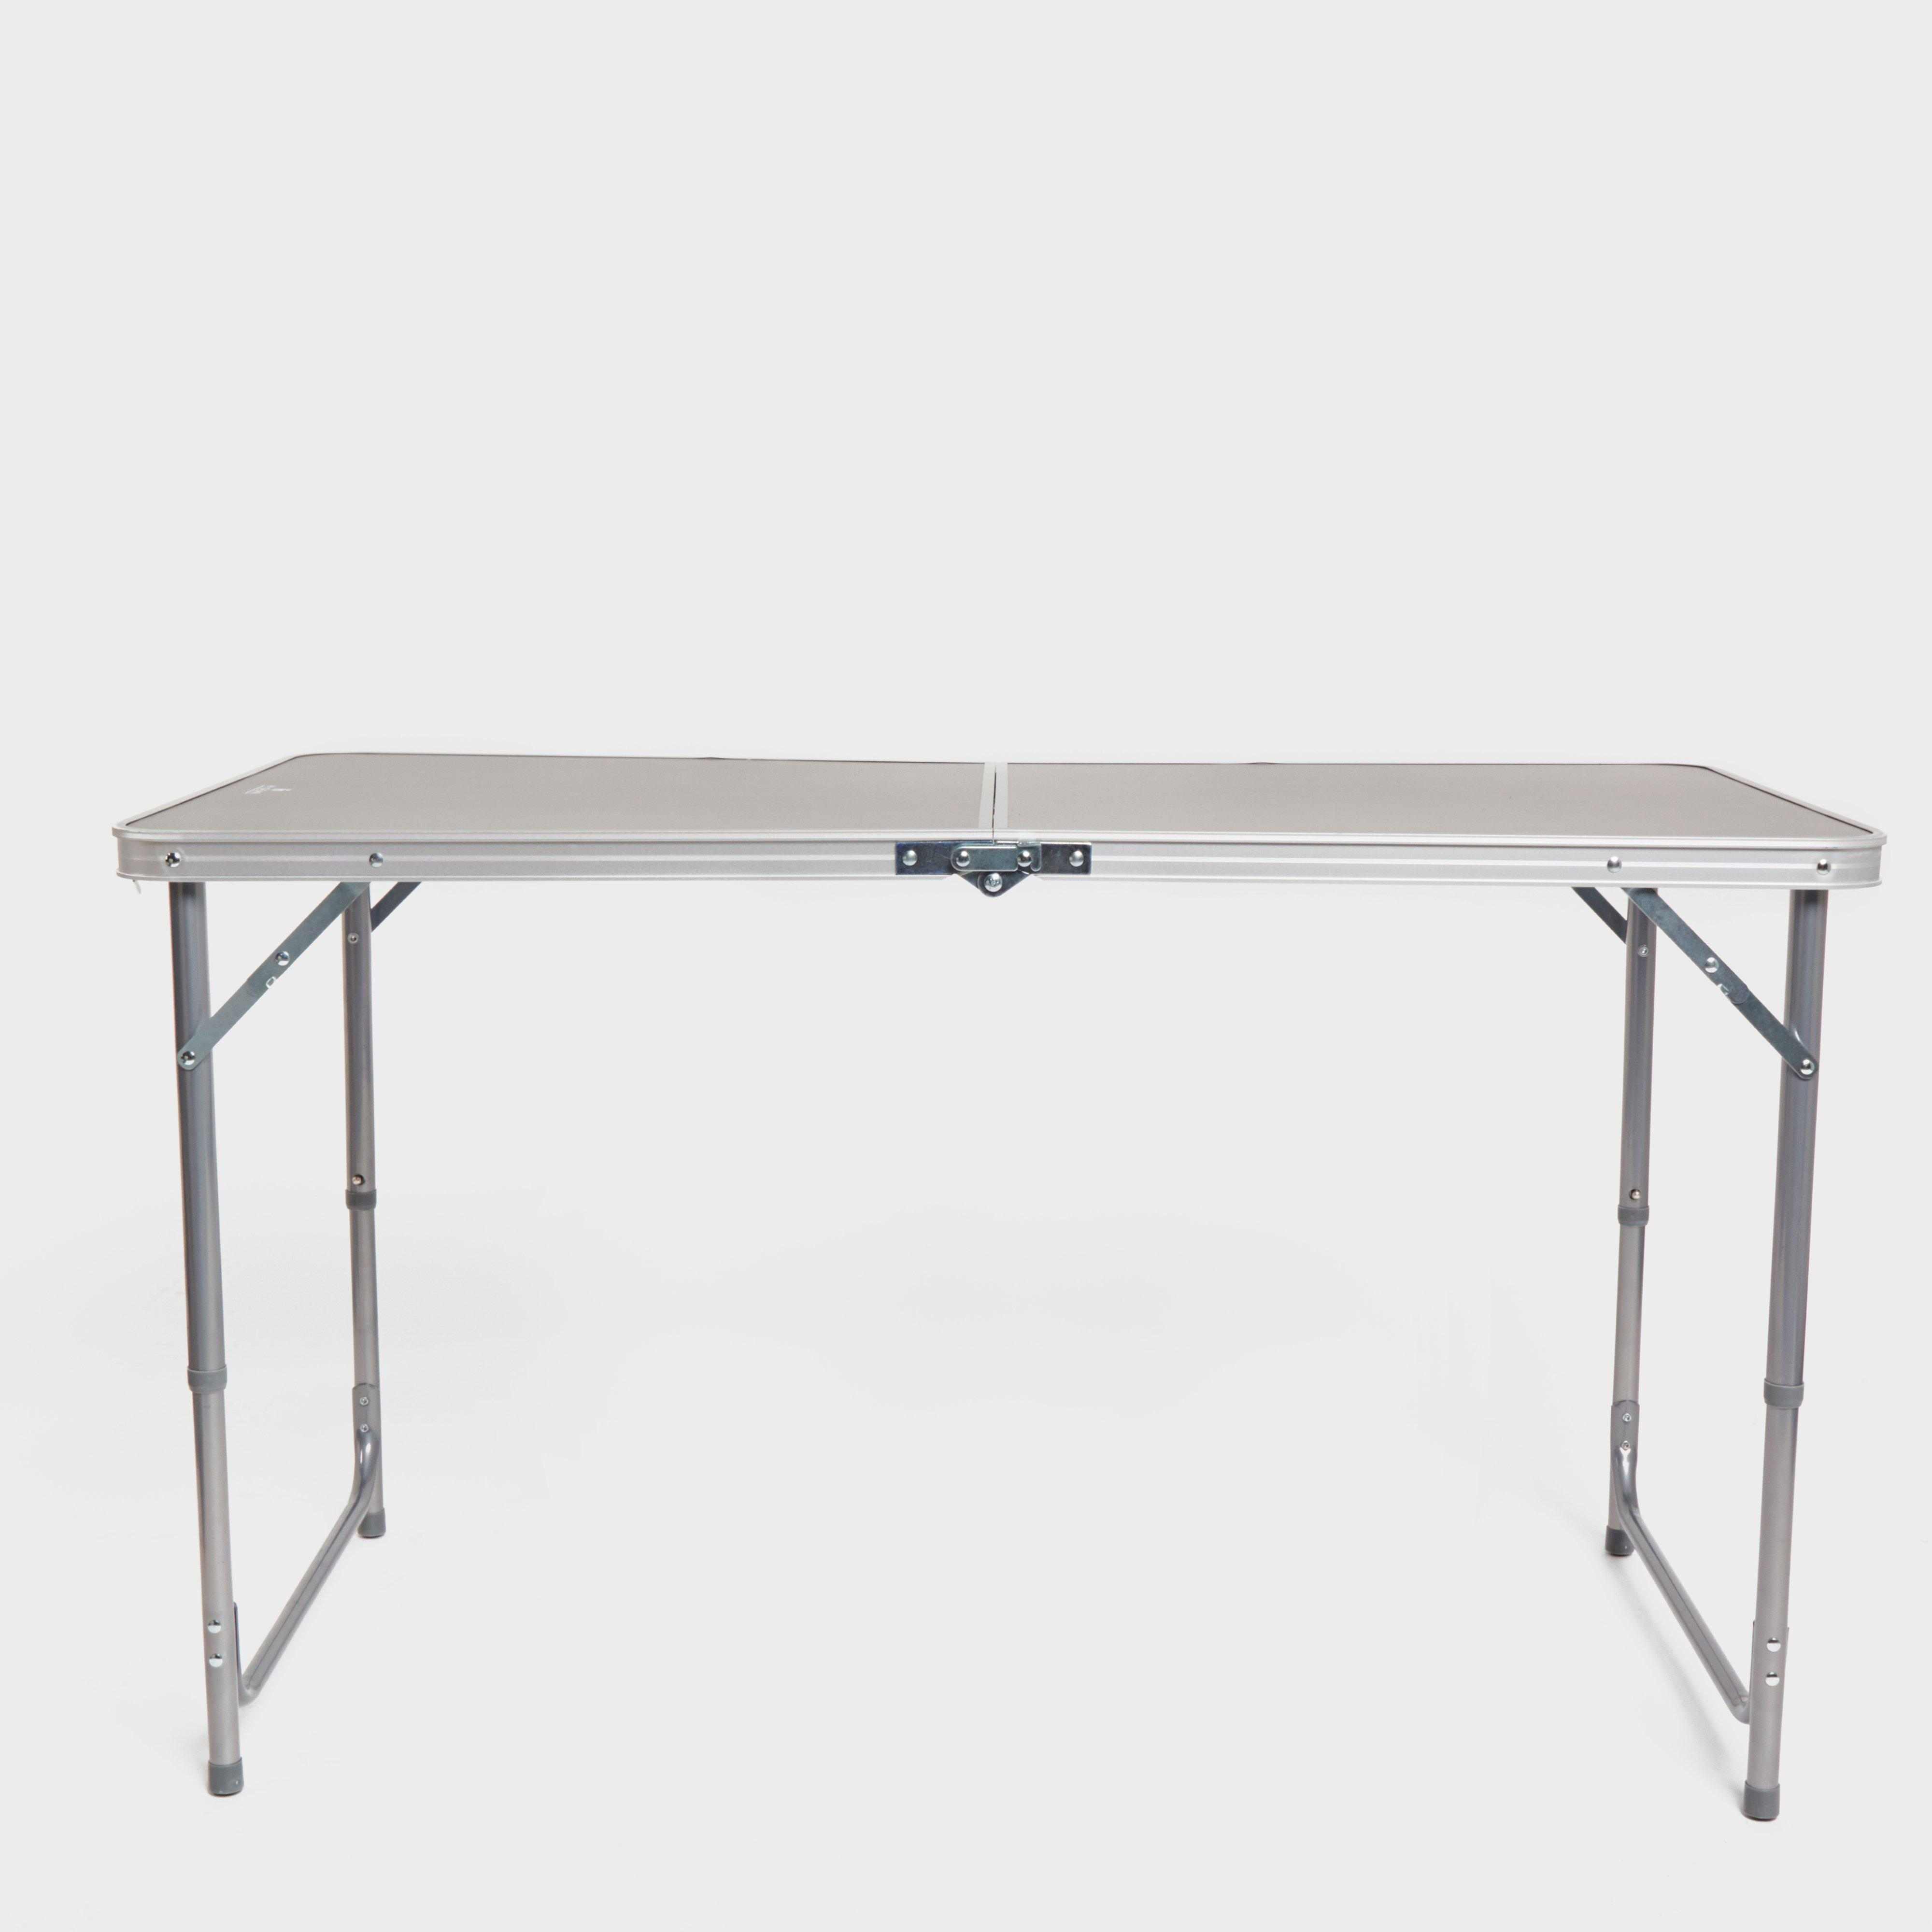 Hi-Gear Hi-Gear Double Picnic Table, Grey